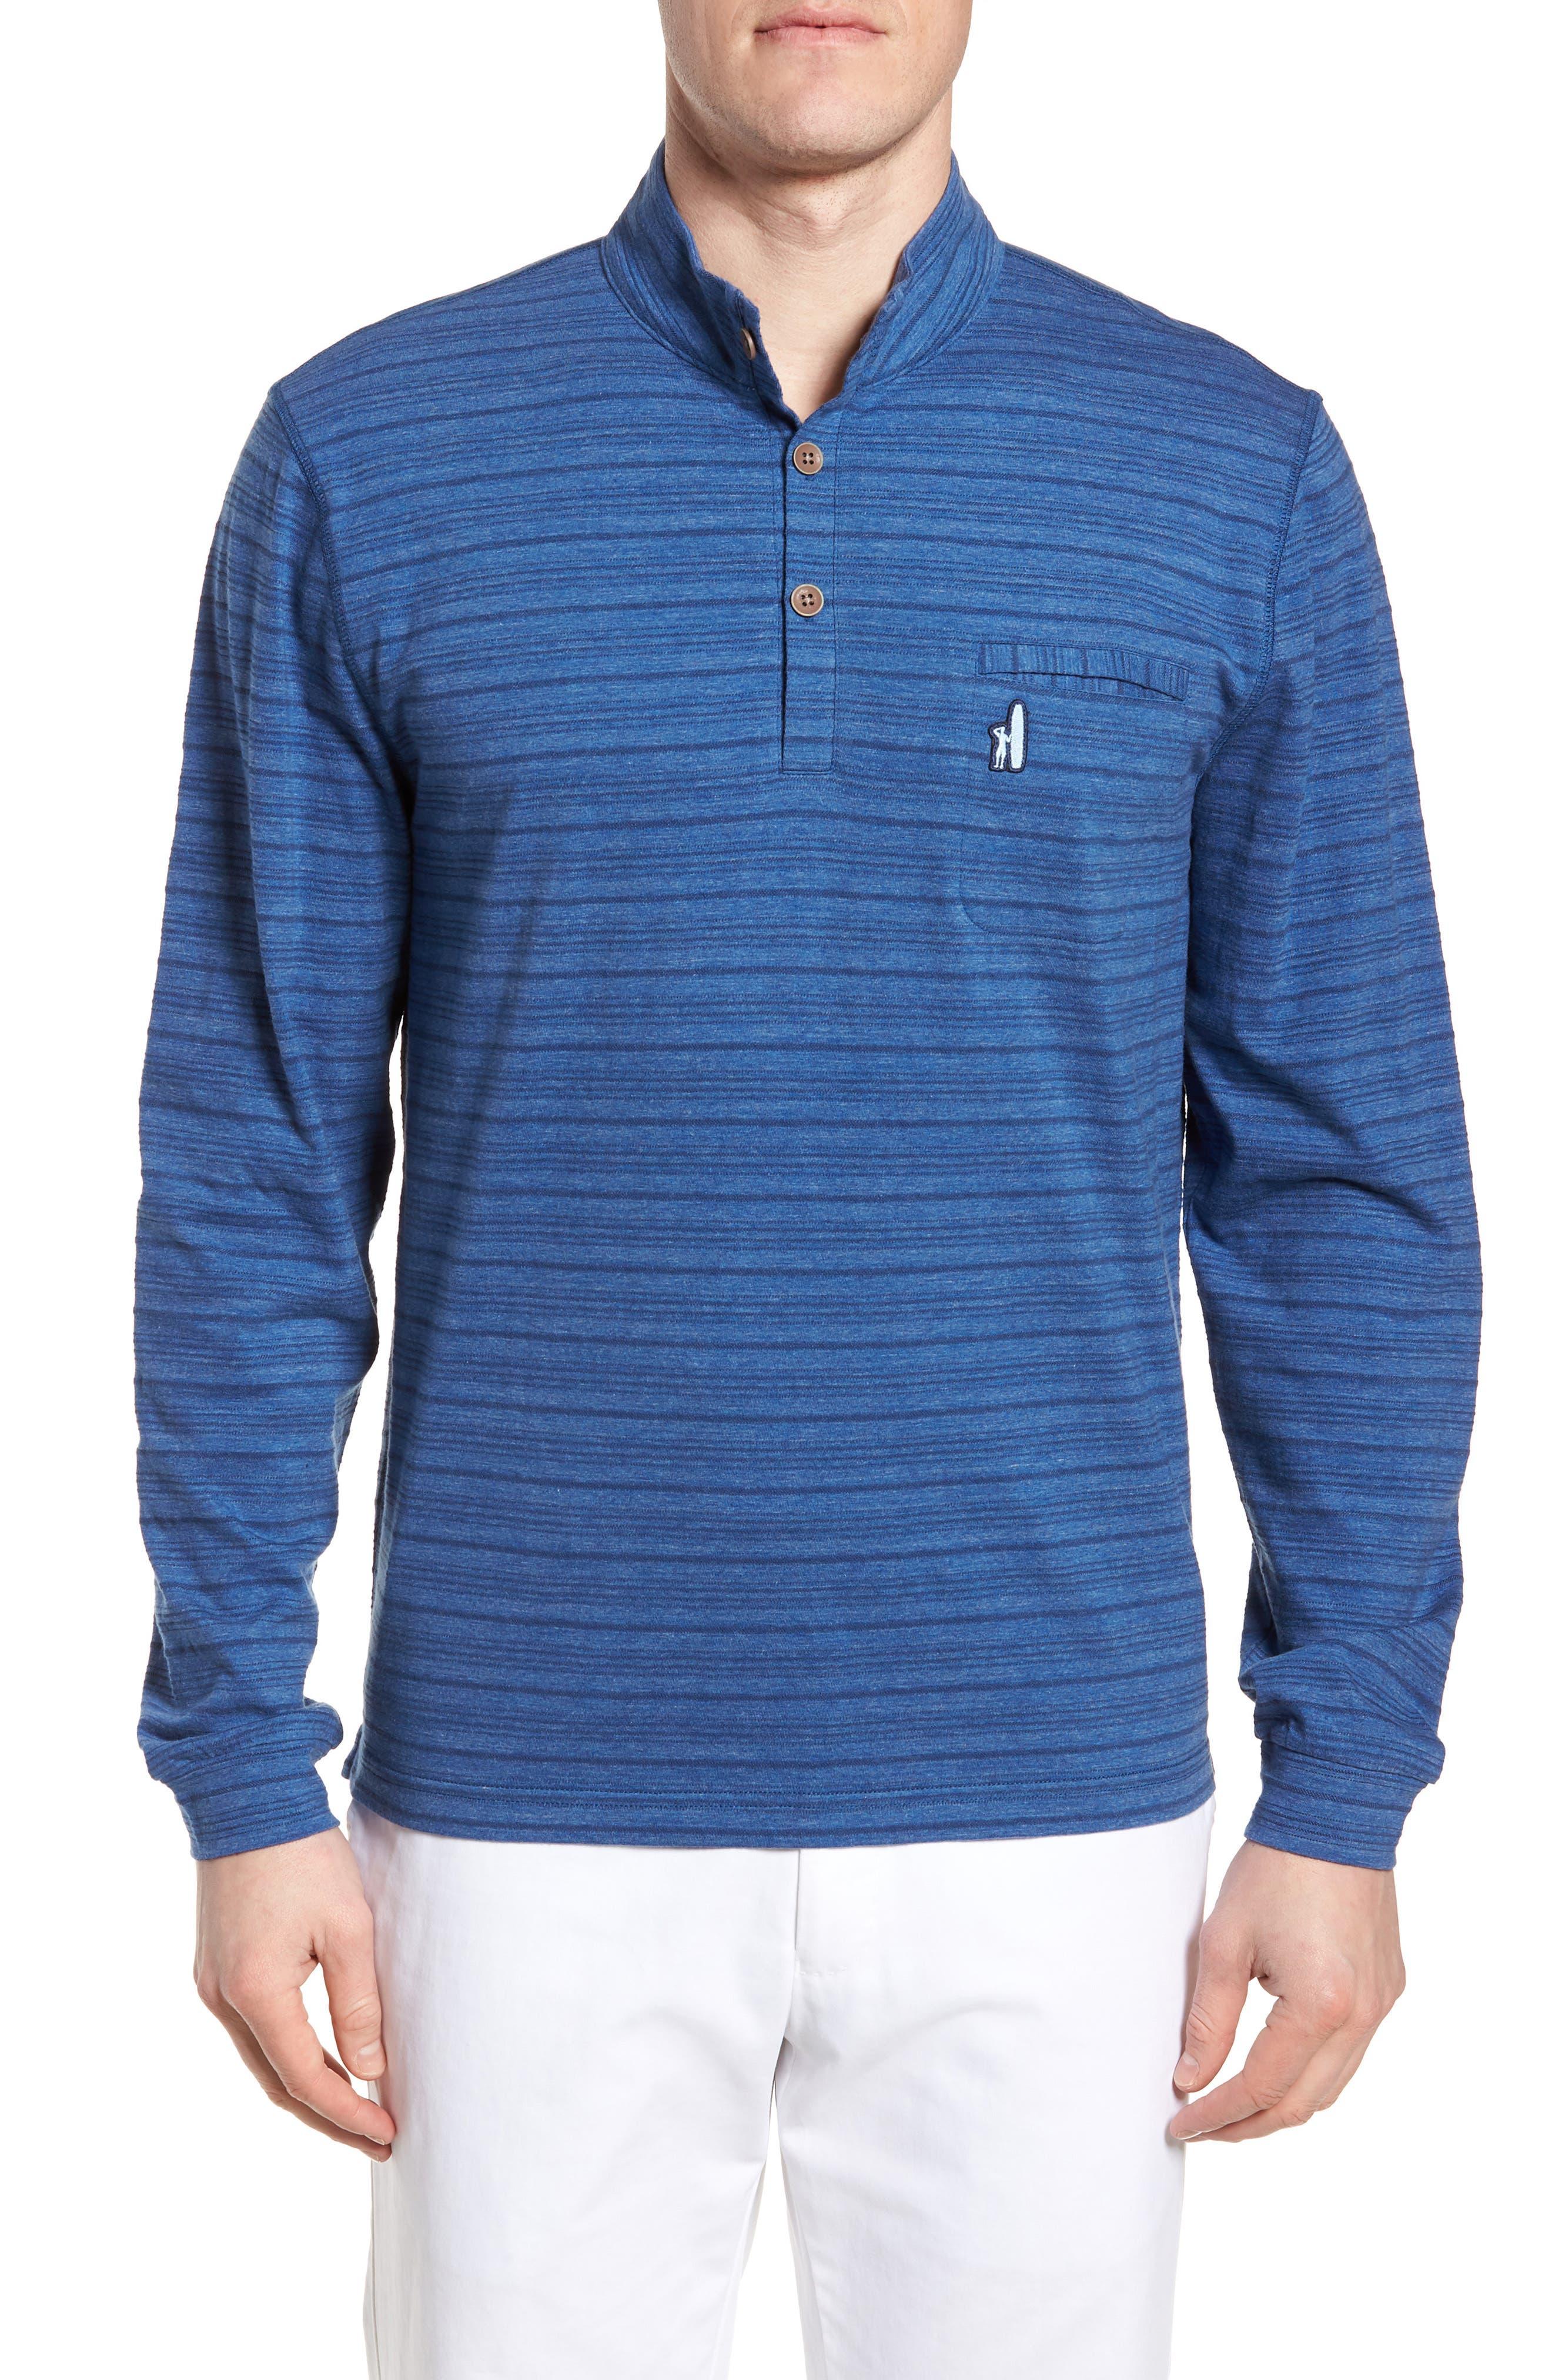 Calder Regular Fit T-Shirt,                         Main,                         color, 200